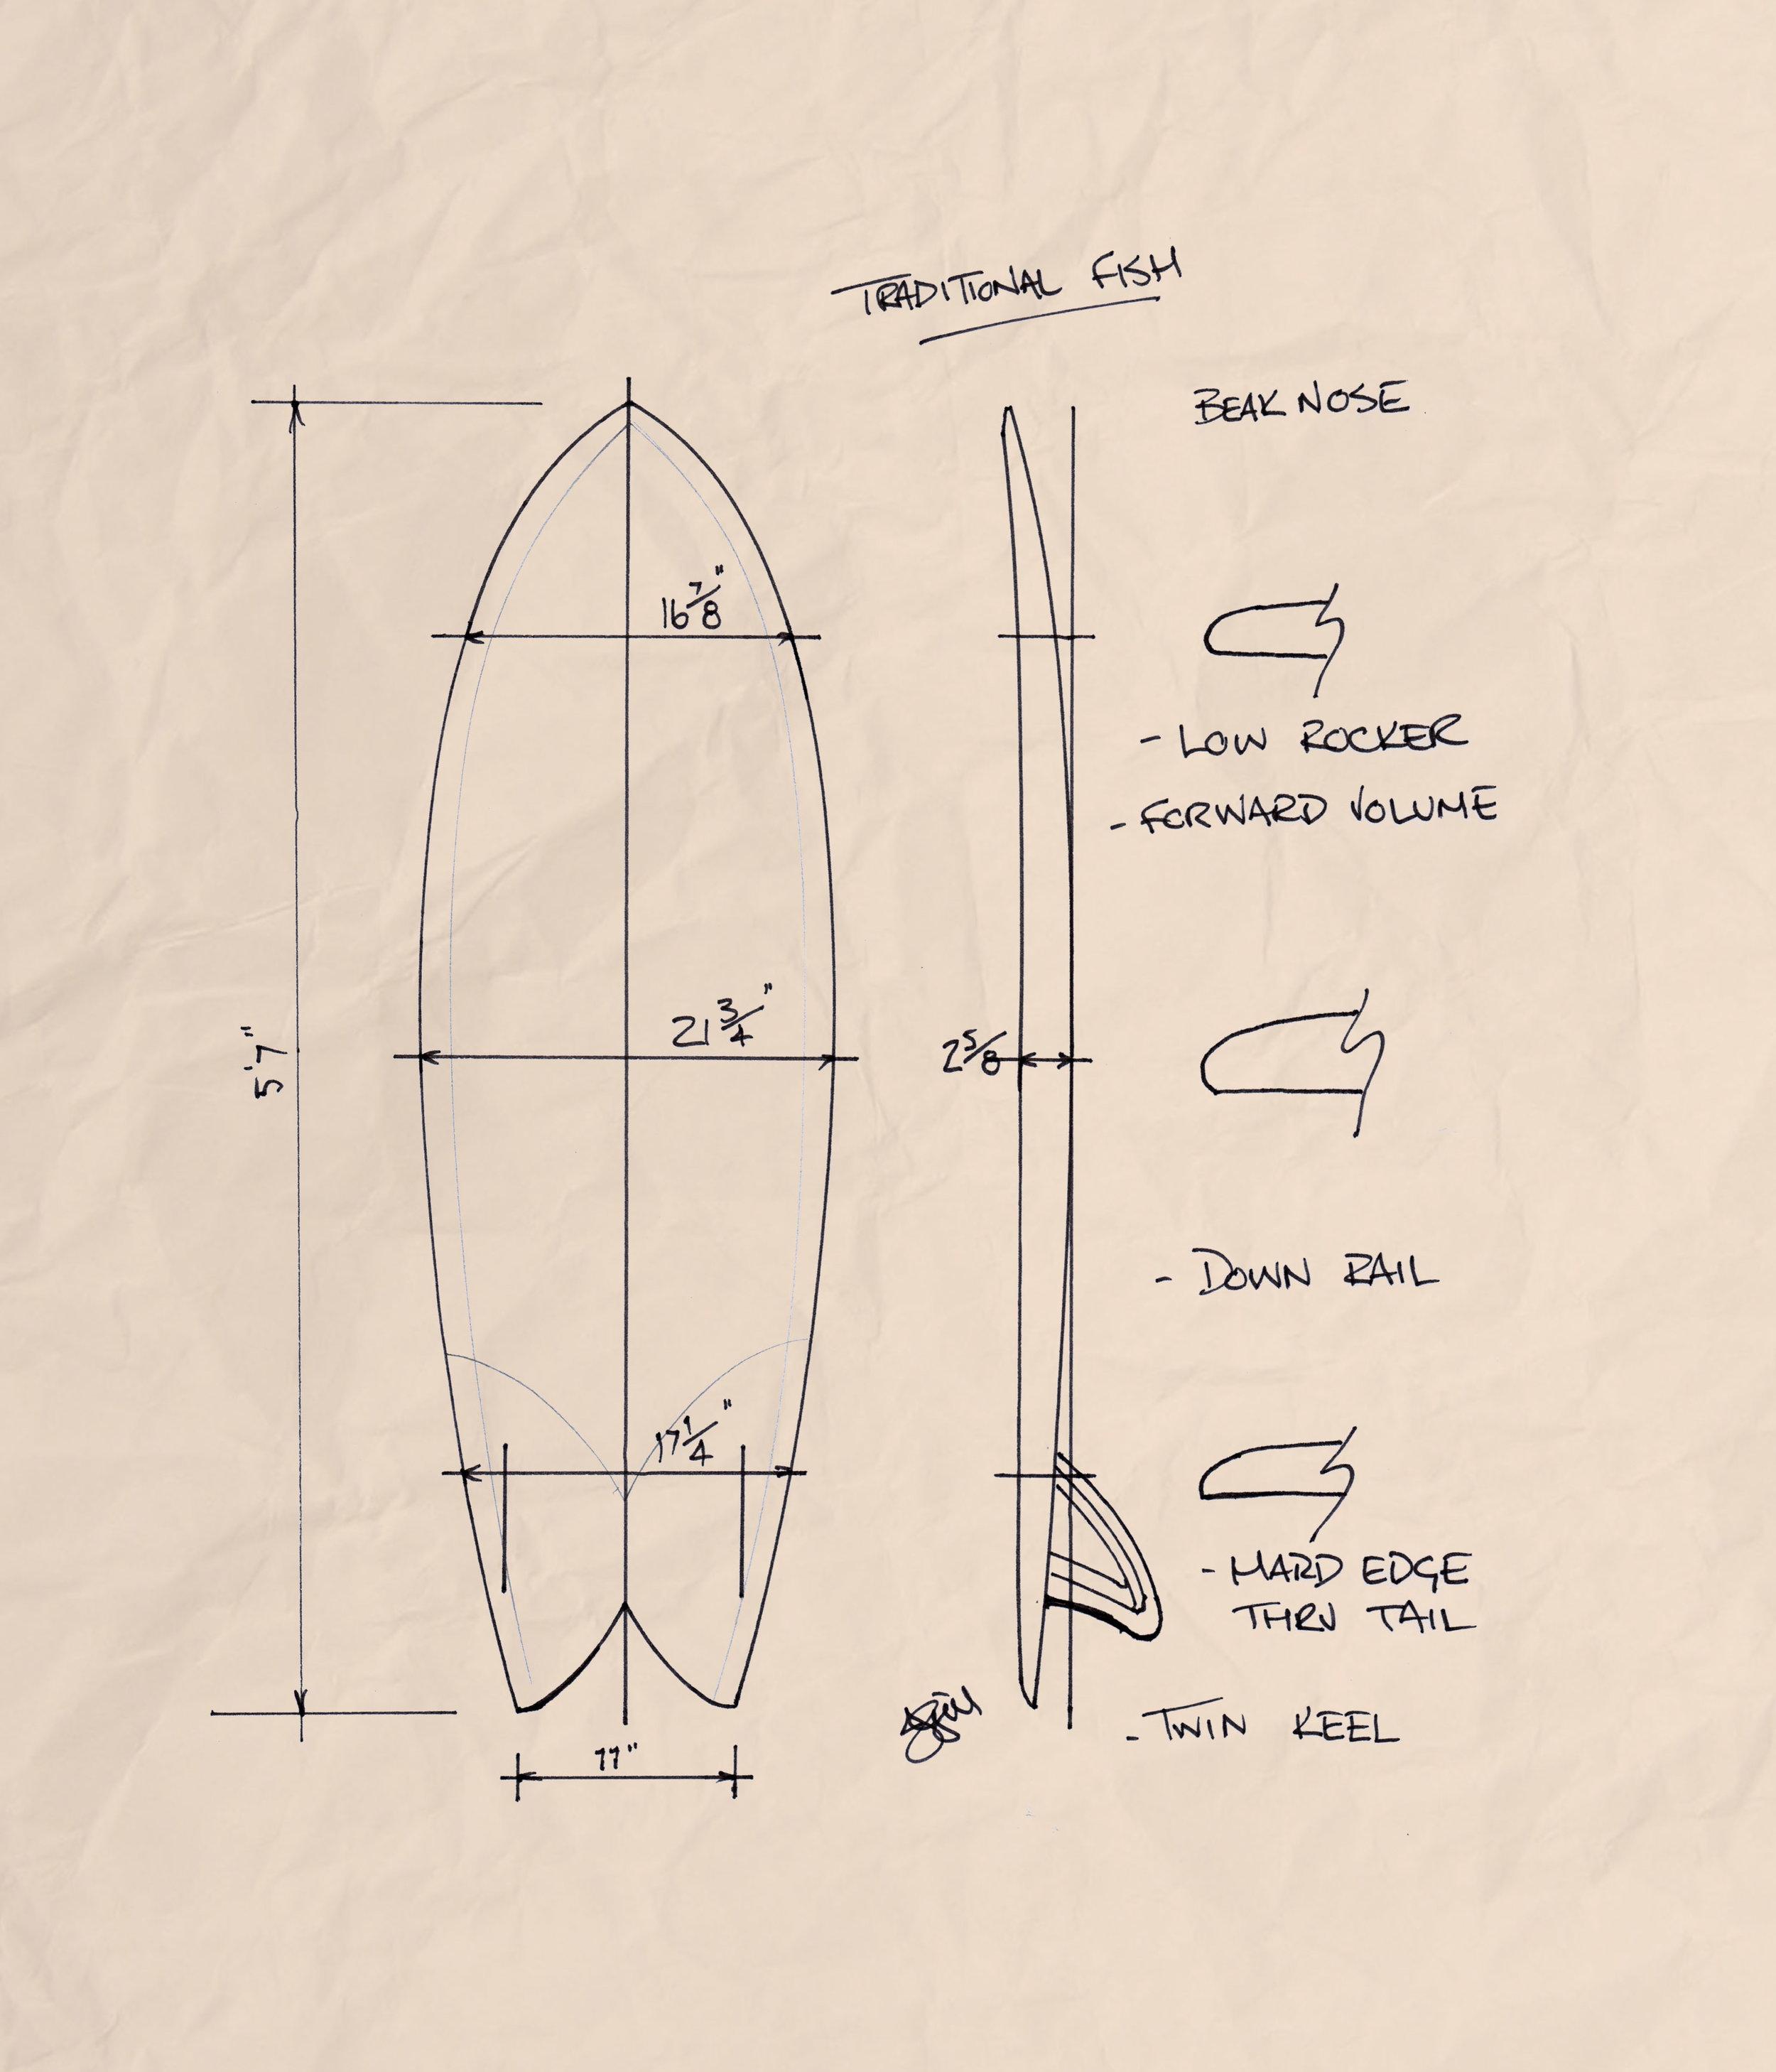 tradfish_blueprint_paper.jpg